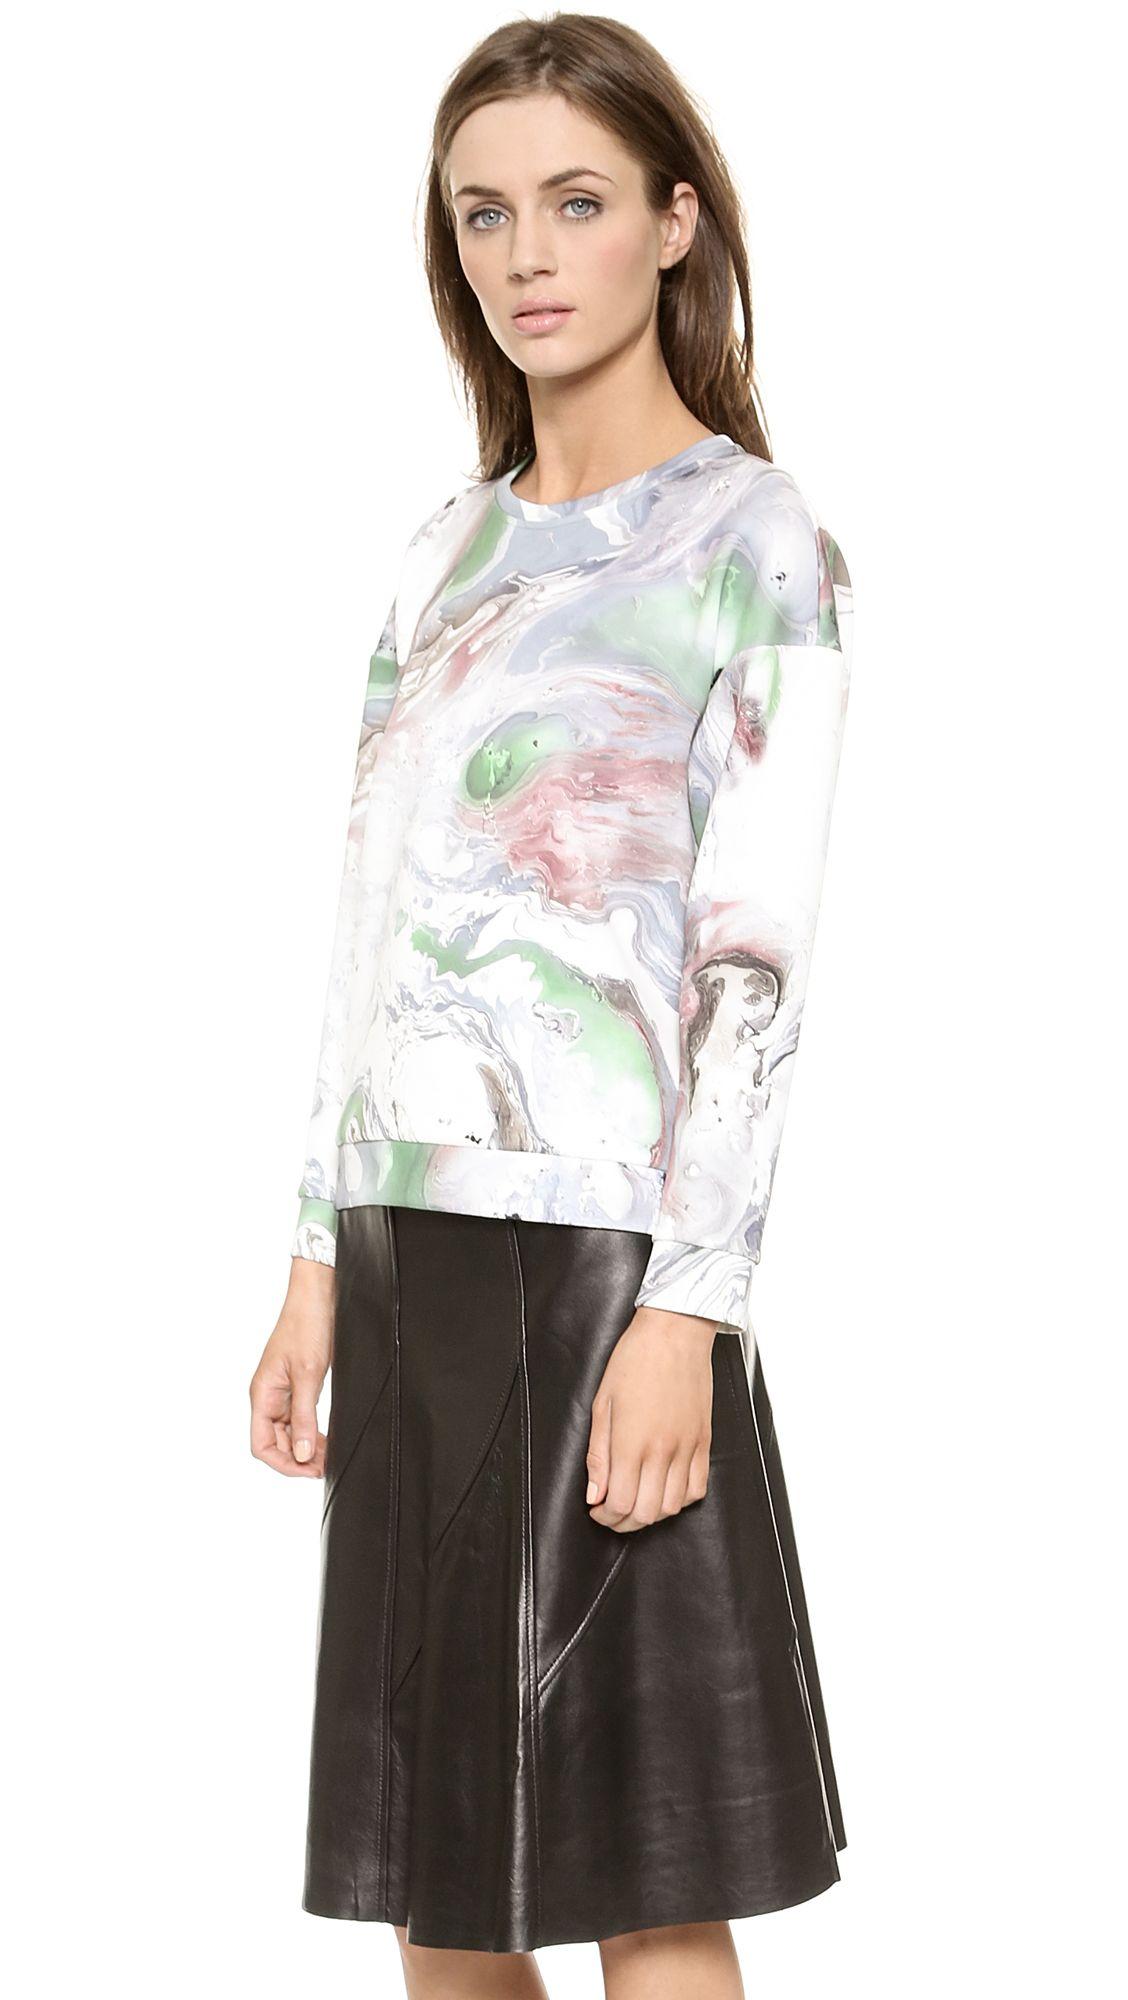 Etre Cecile Cheetah Insignia Short Sleeve Sweatshirt   SHOPBOP